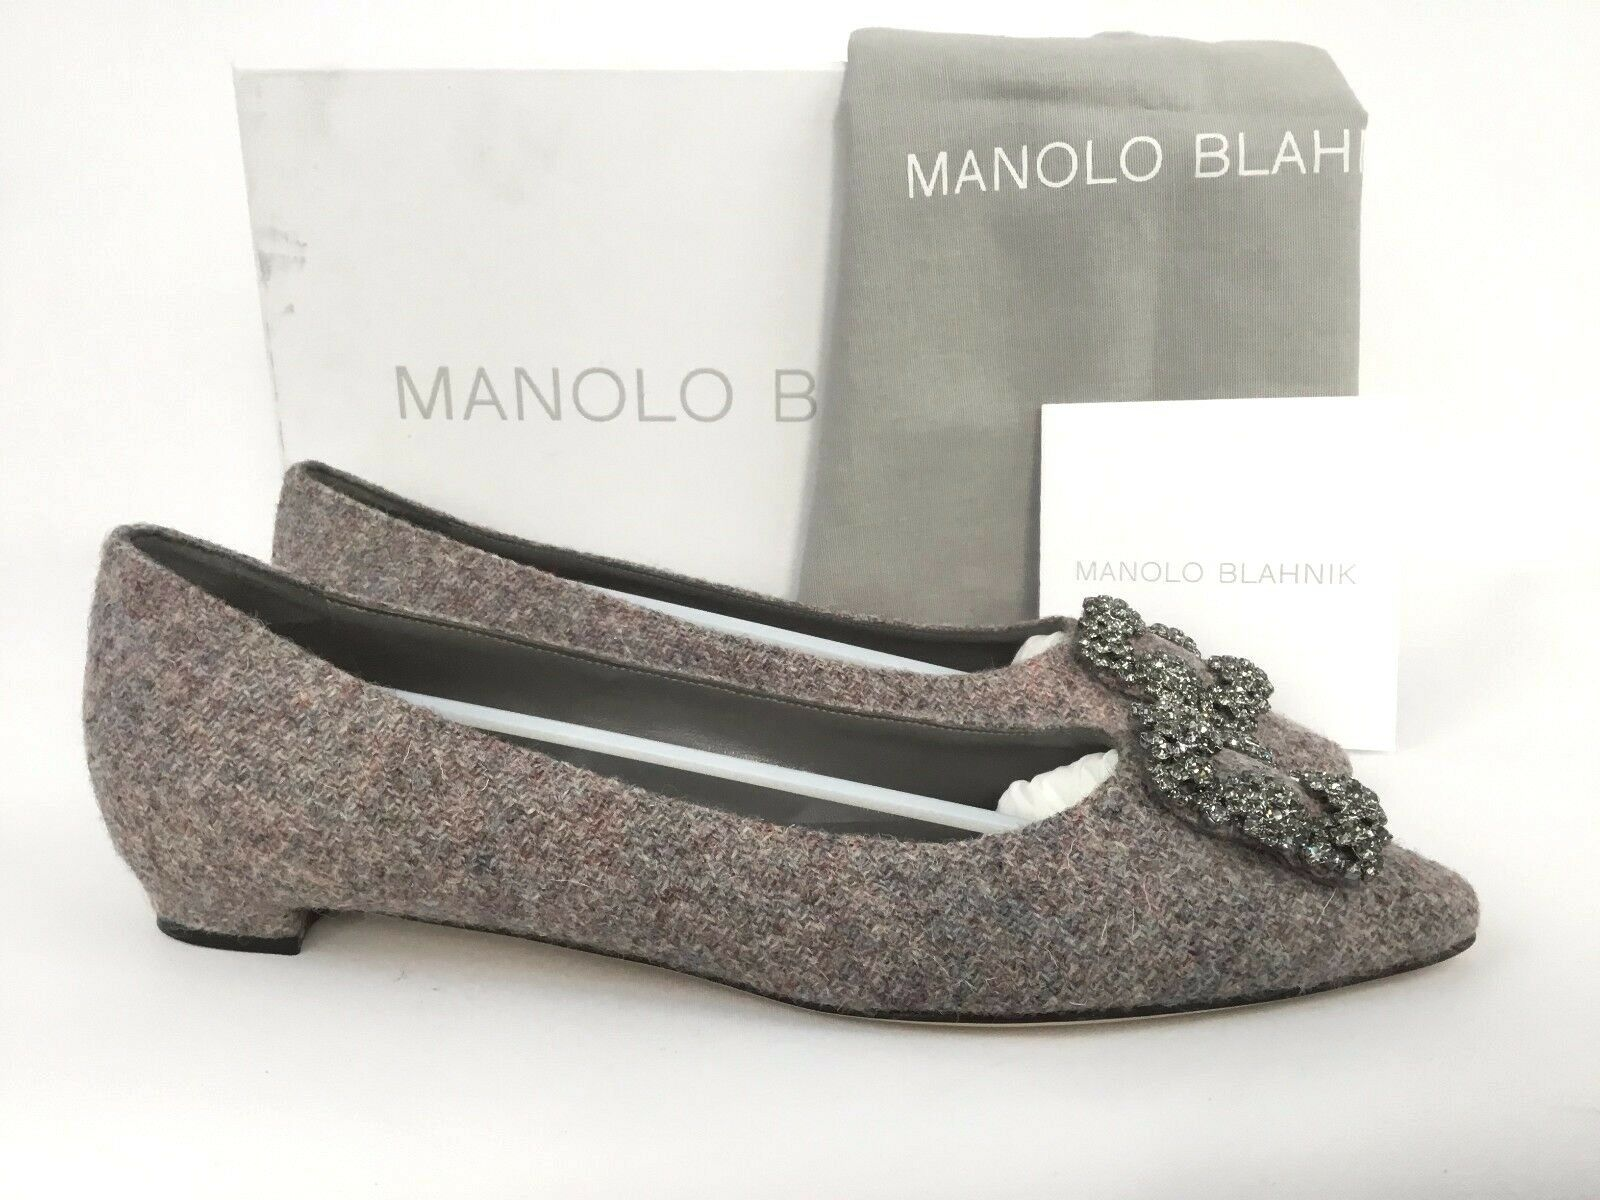 consegna gratuita Manolo Blahnik Blahnik Blahnik Hangisi Jeweled grigio Tweed Pointy Toe Flat 42 12  offerta speciale